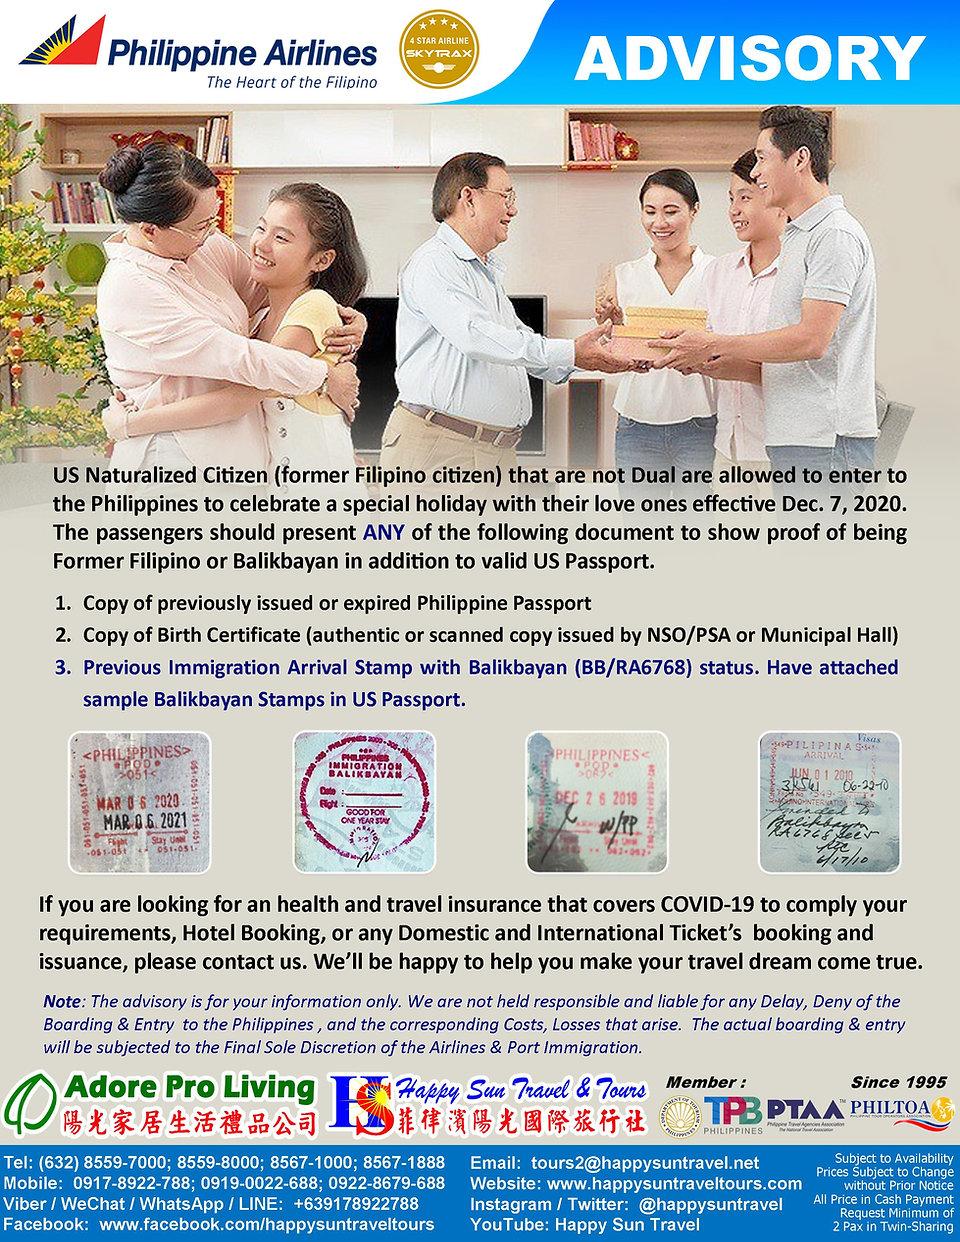 P1_US NaturalizedCitizen_BalikbayanToPH_